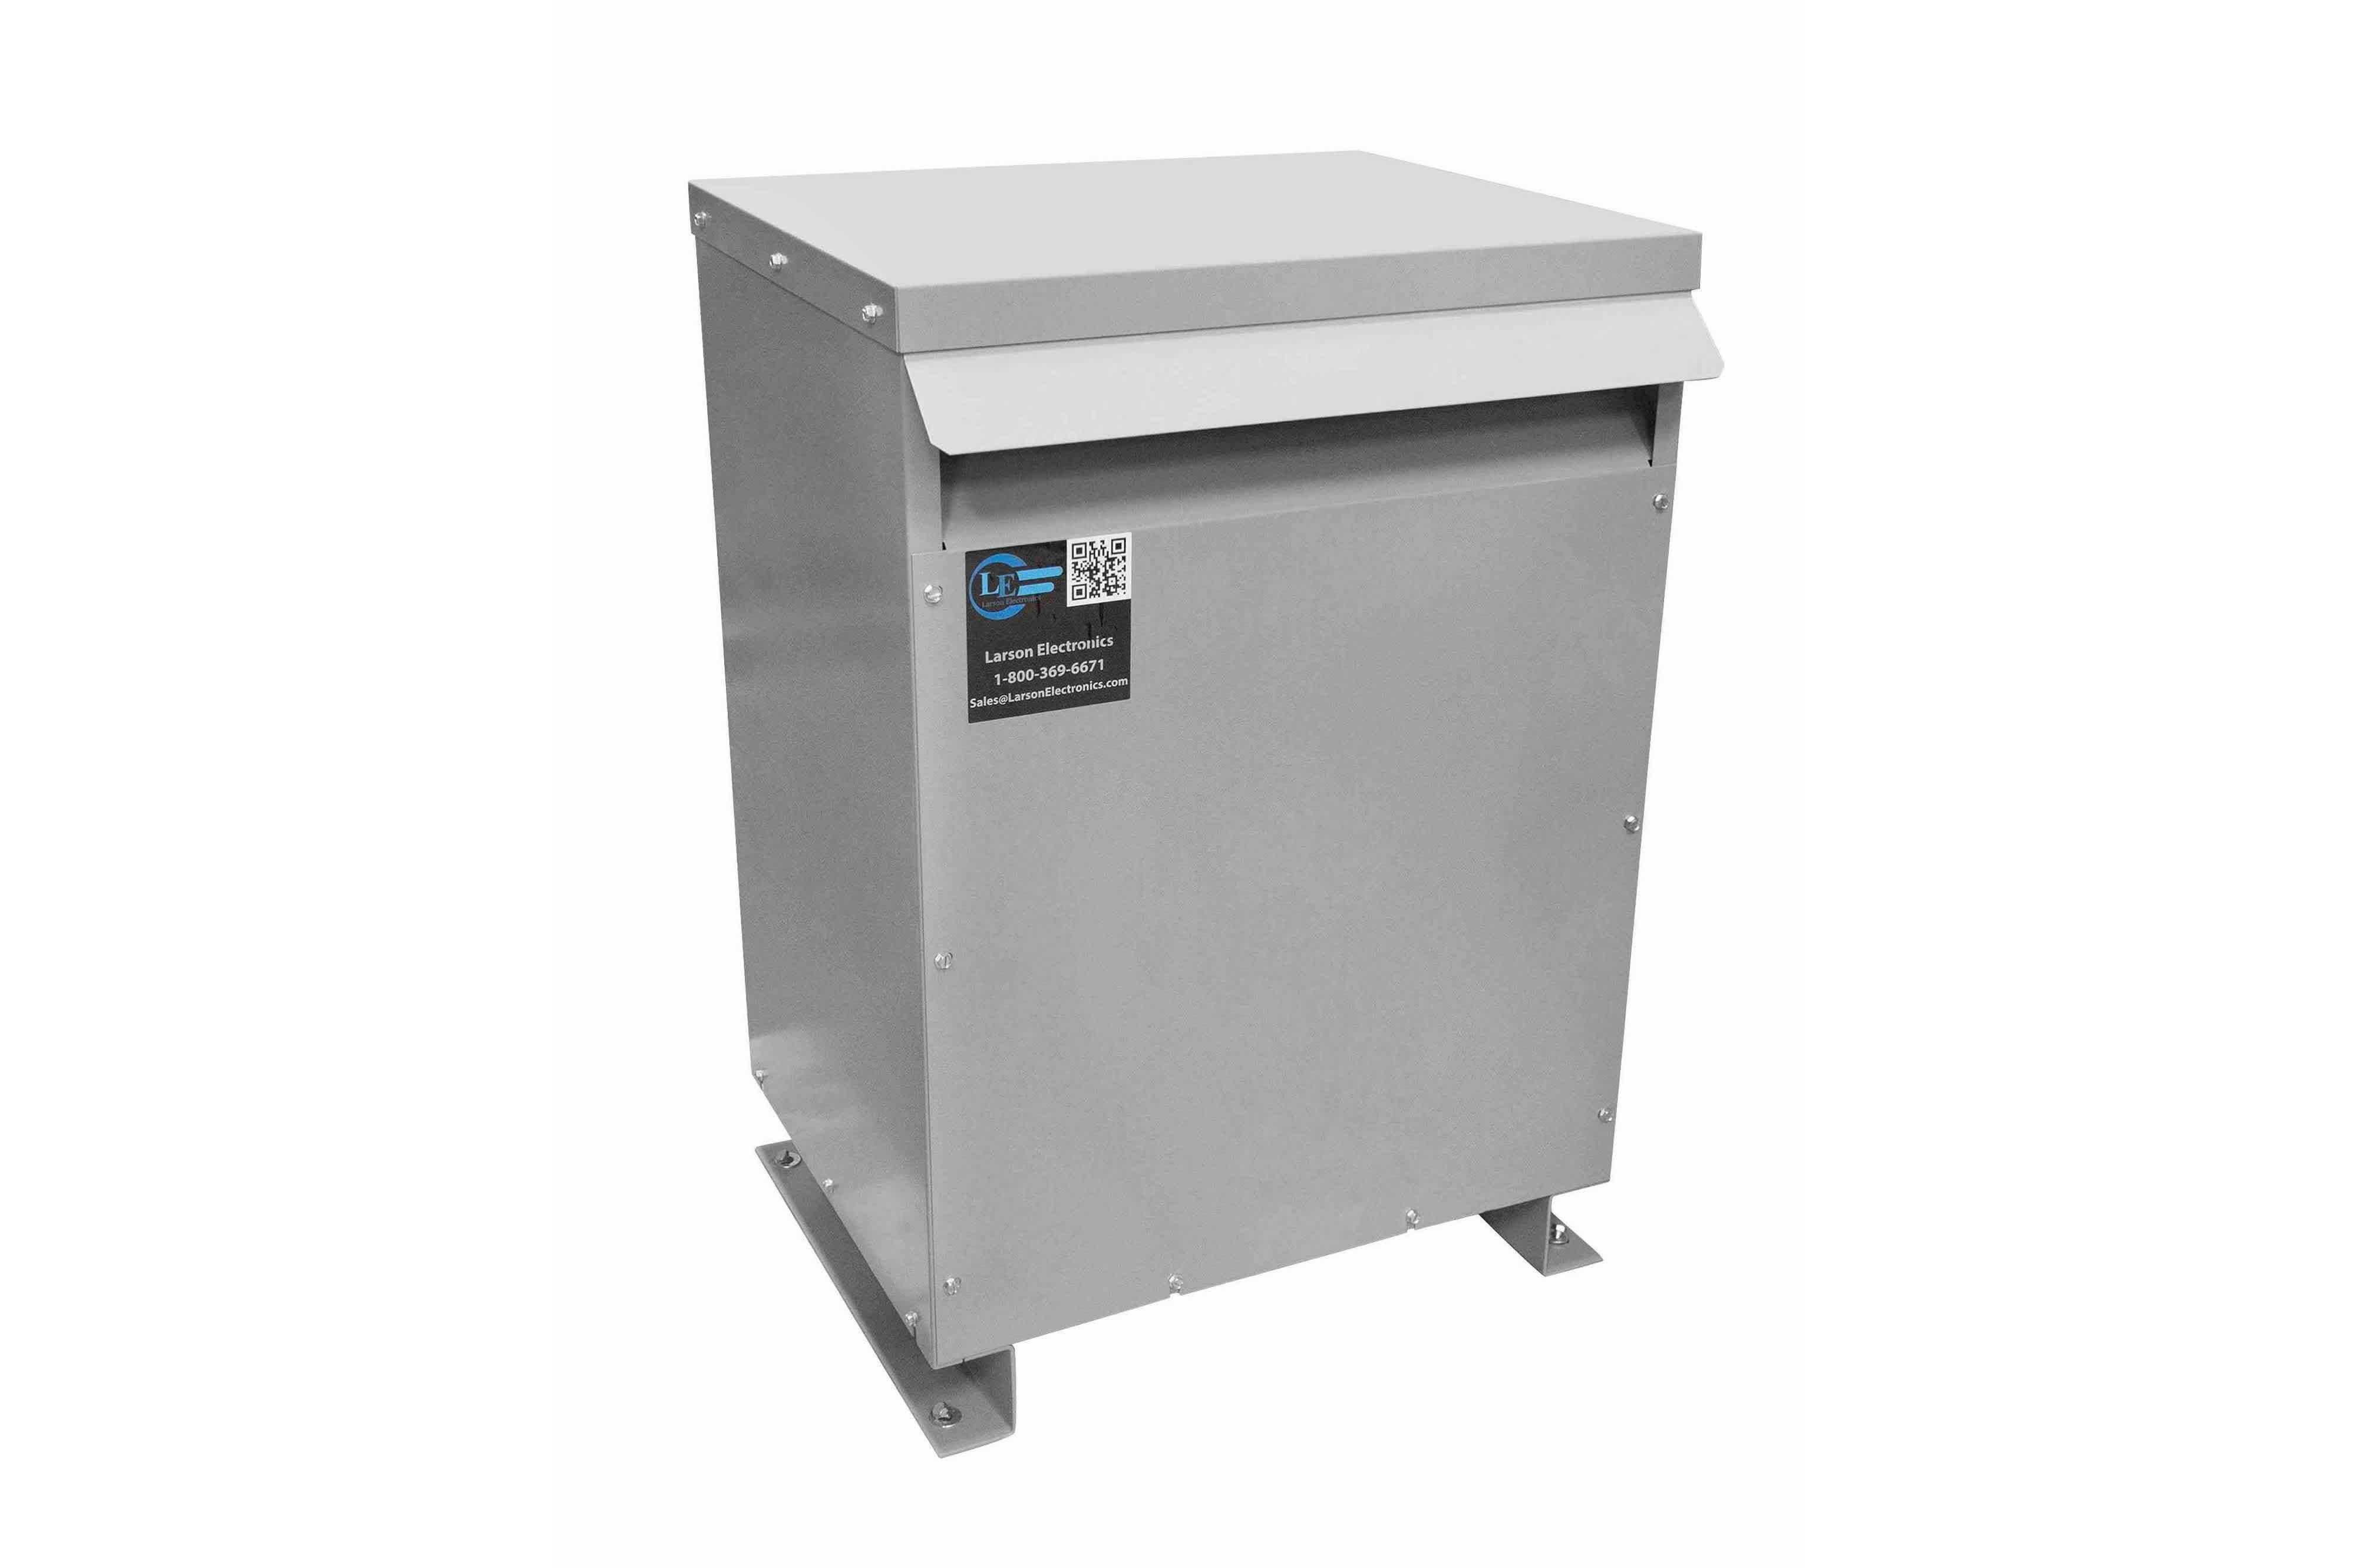 150 kVA 3PH Isolation Transformer, 600V Wye Primary, 460V Delta Secondary, N3R, Ventilated, 60 Hz